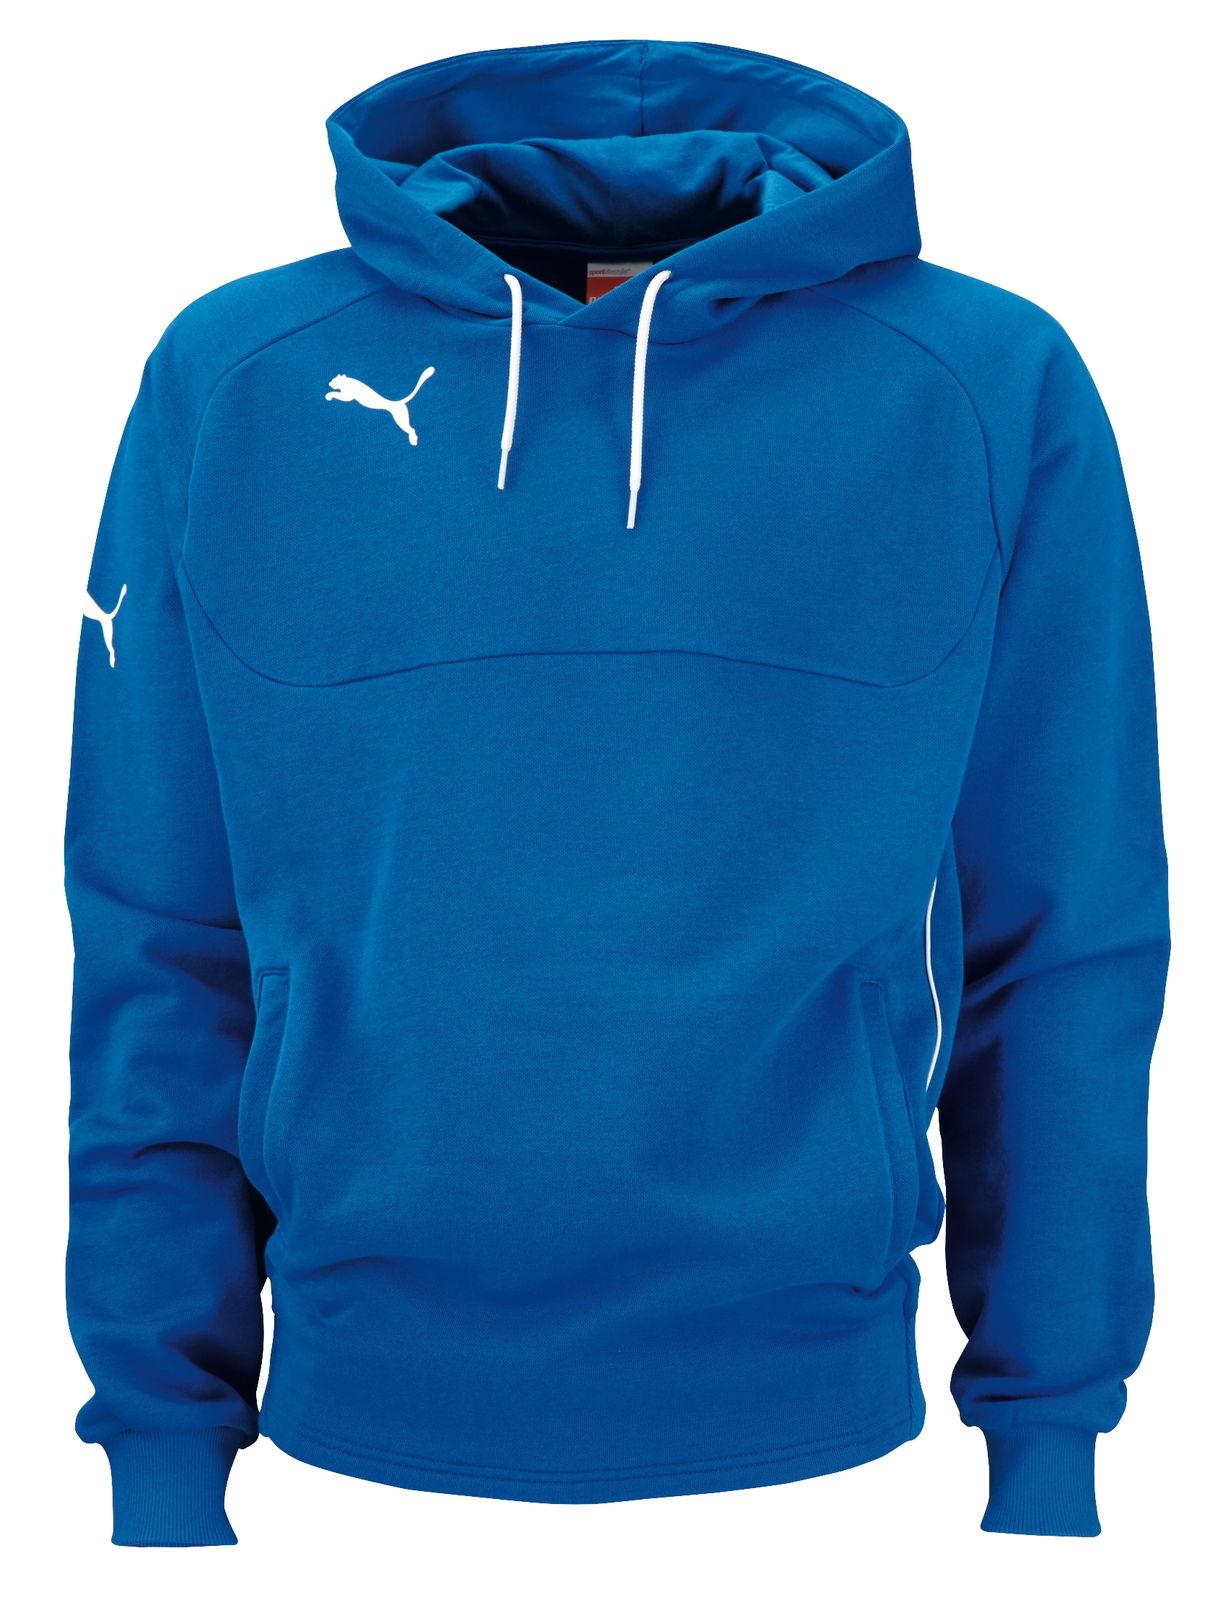 Puma Herren Hoody Kapuzenpullover Pullover Kapuze Hooded Sweatshirt Blau NEU